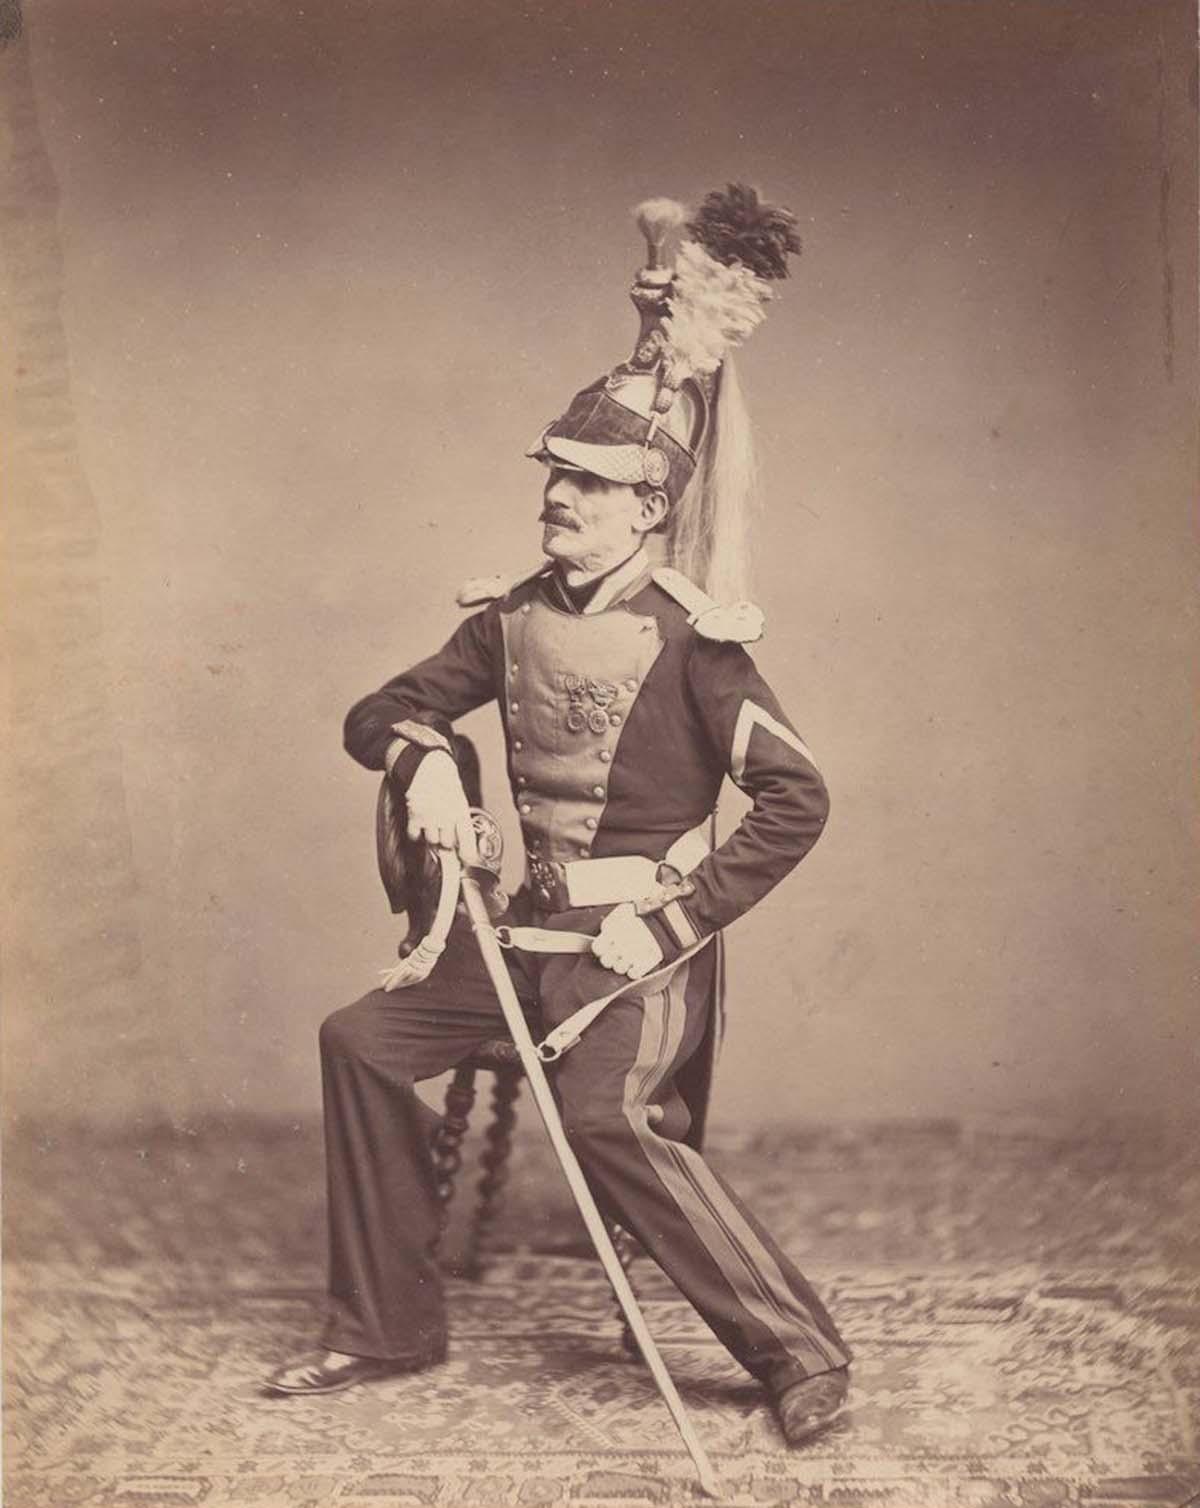 Monsieur Mauban of the 8th Dragoon Regiment of 1815.